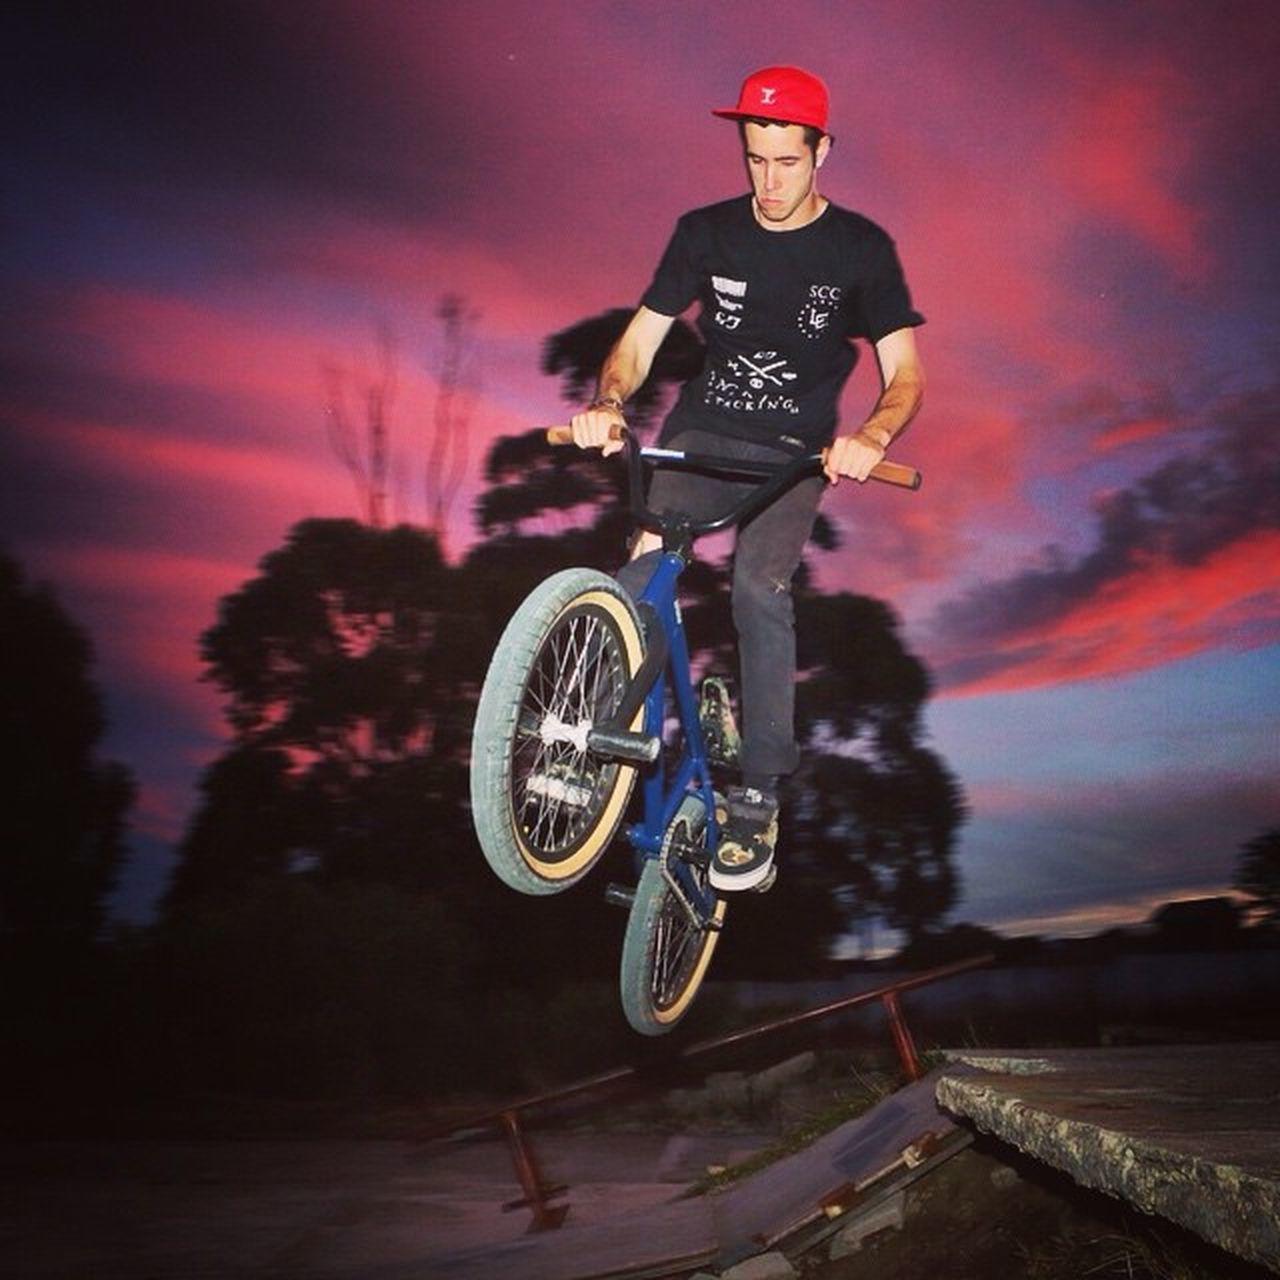 Gareth Killeen riding @loot_brand secret location, Gottabeinittowinit Bmx  Street Shooteditsleeprepeat Rebelmediaguys